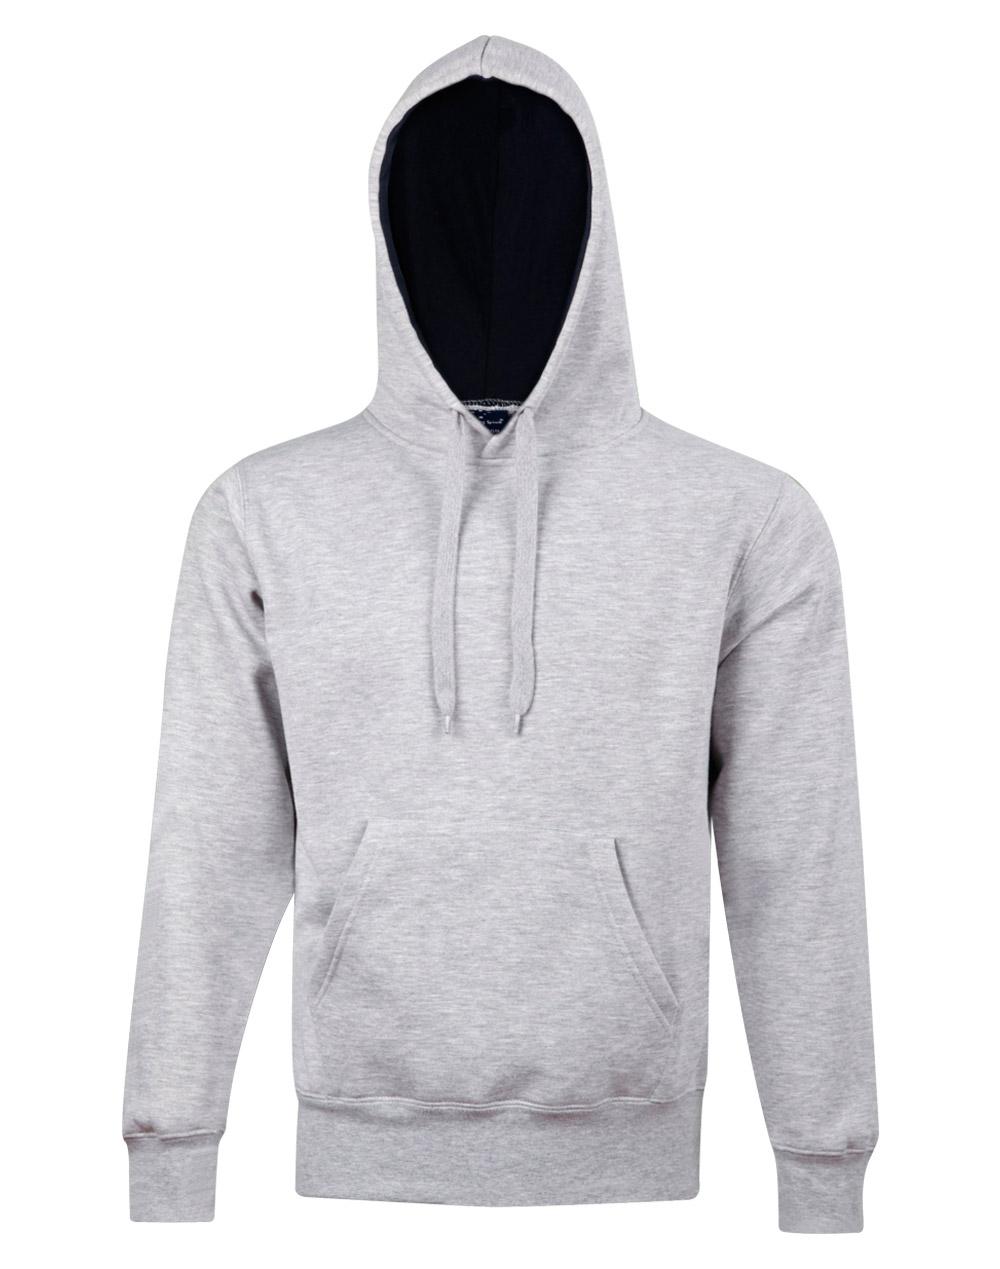 Grey.Navy